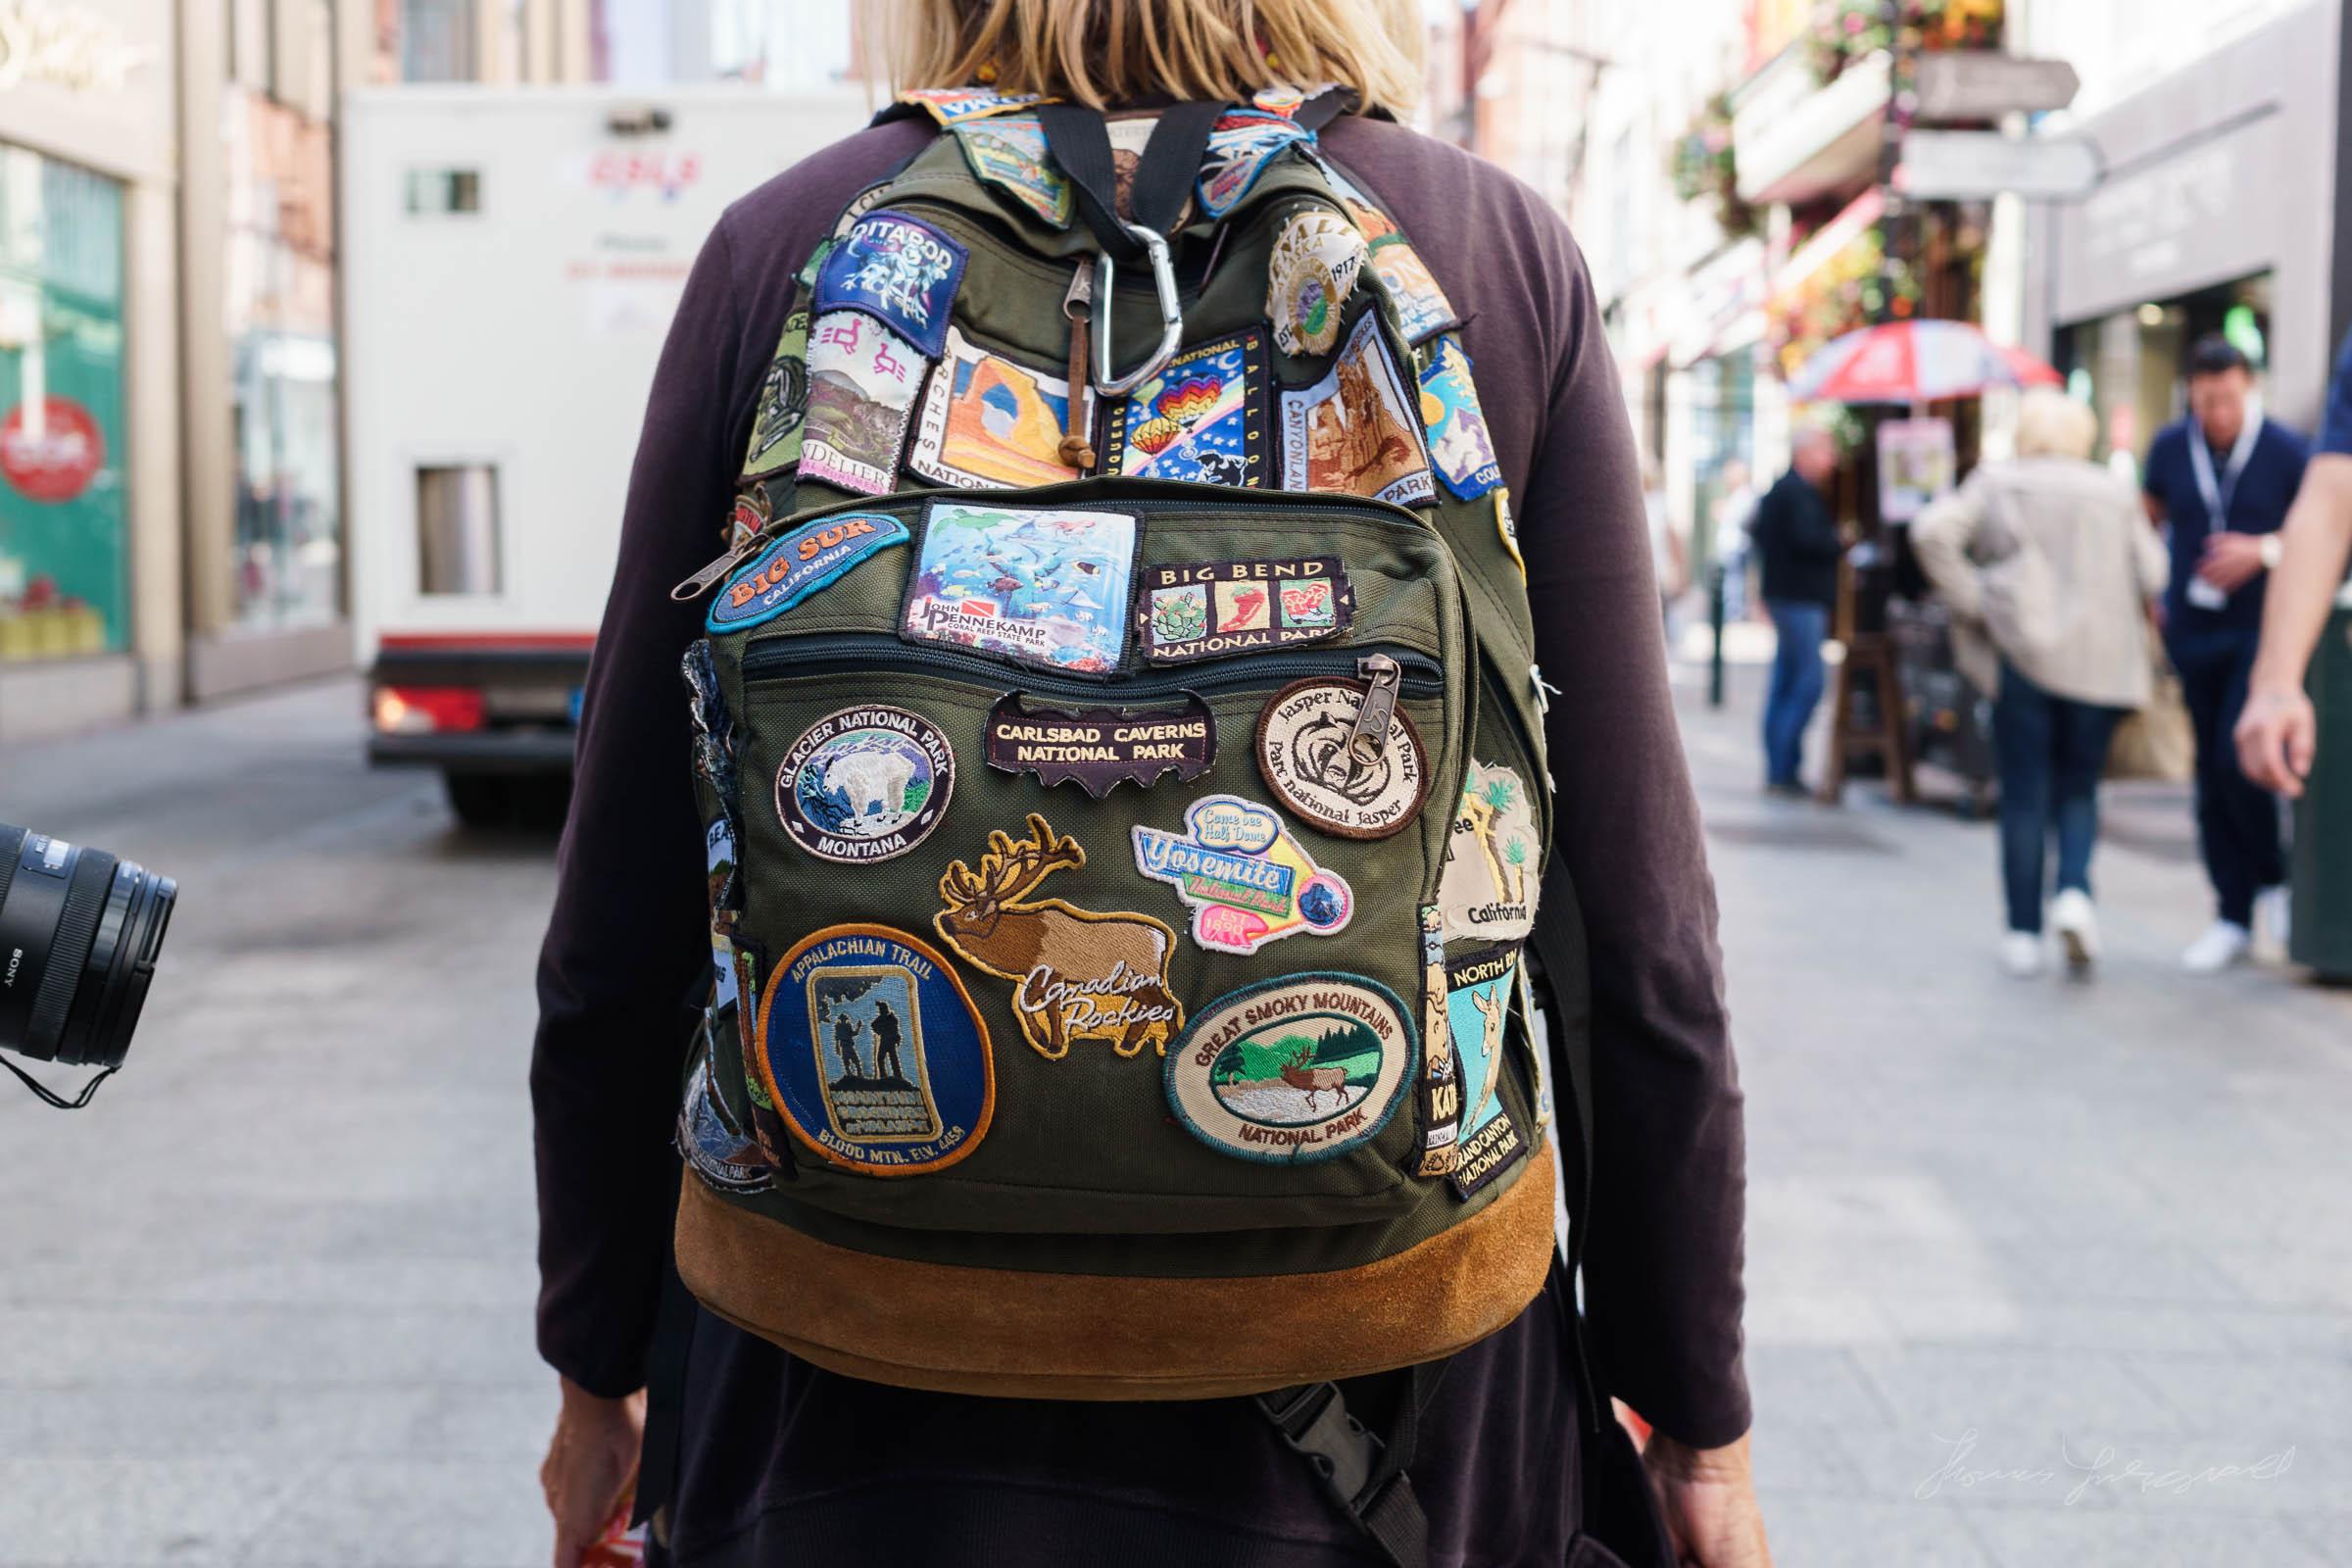 Interesting Backpack